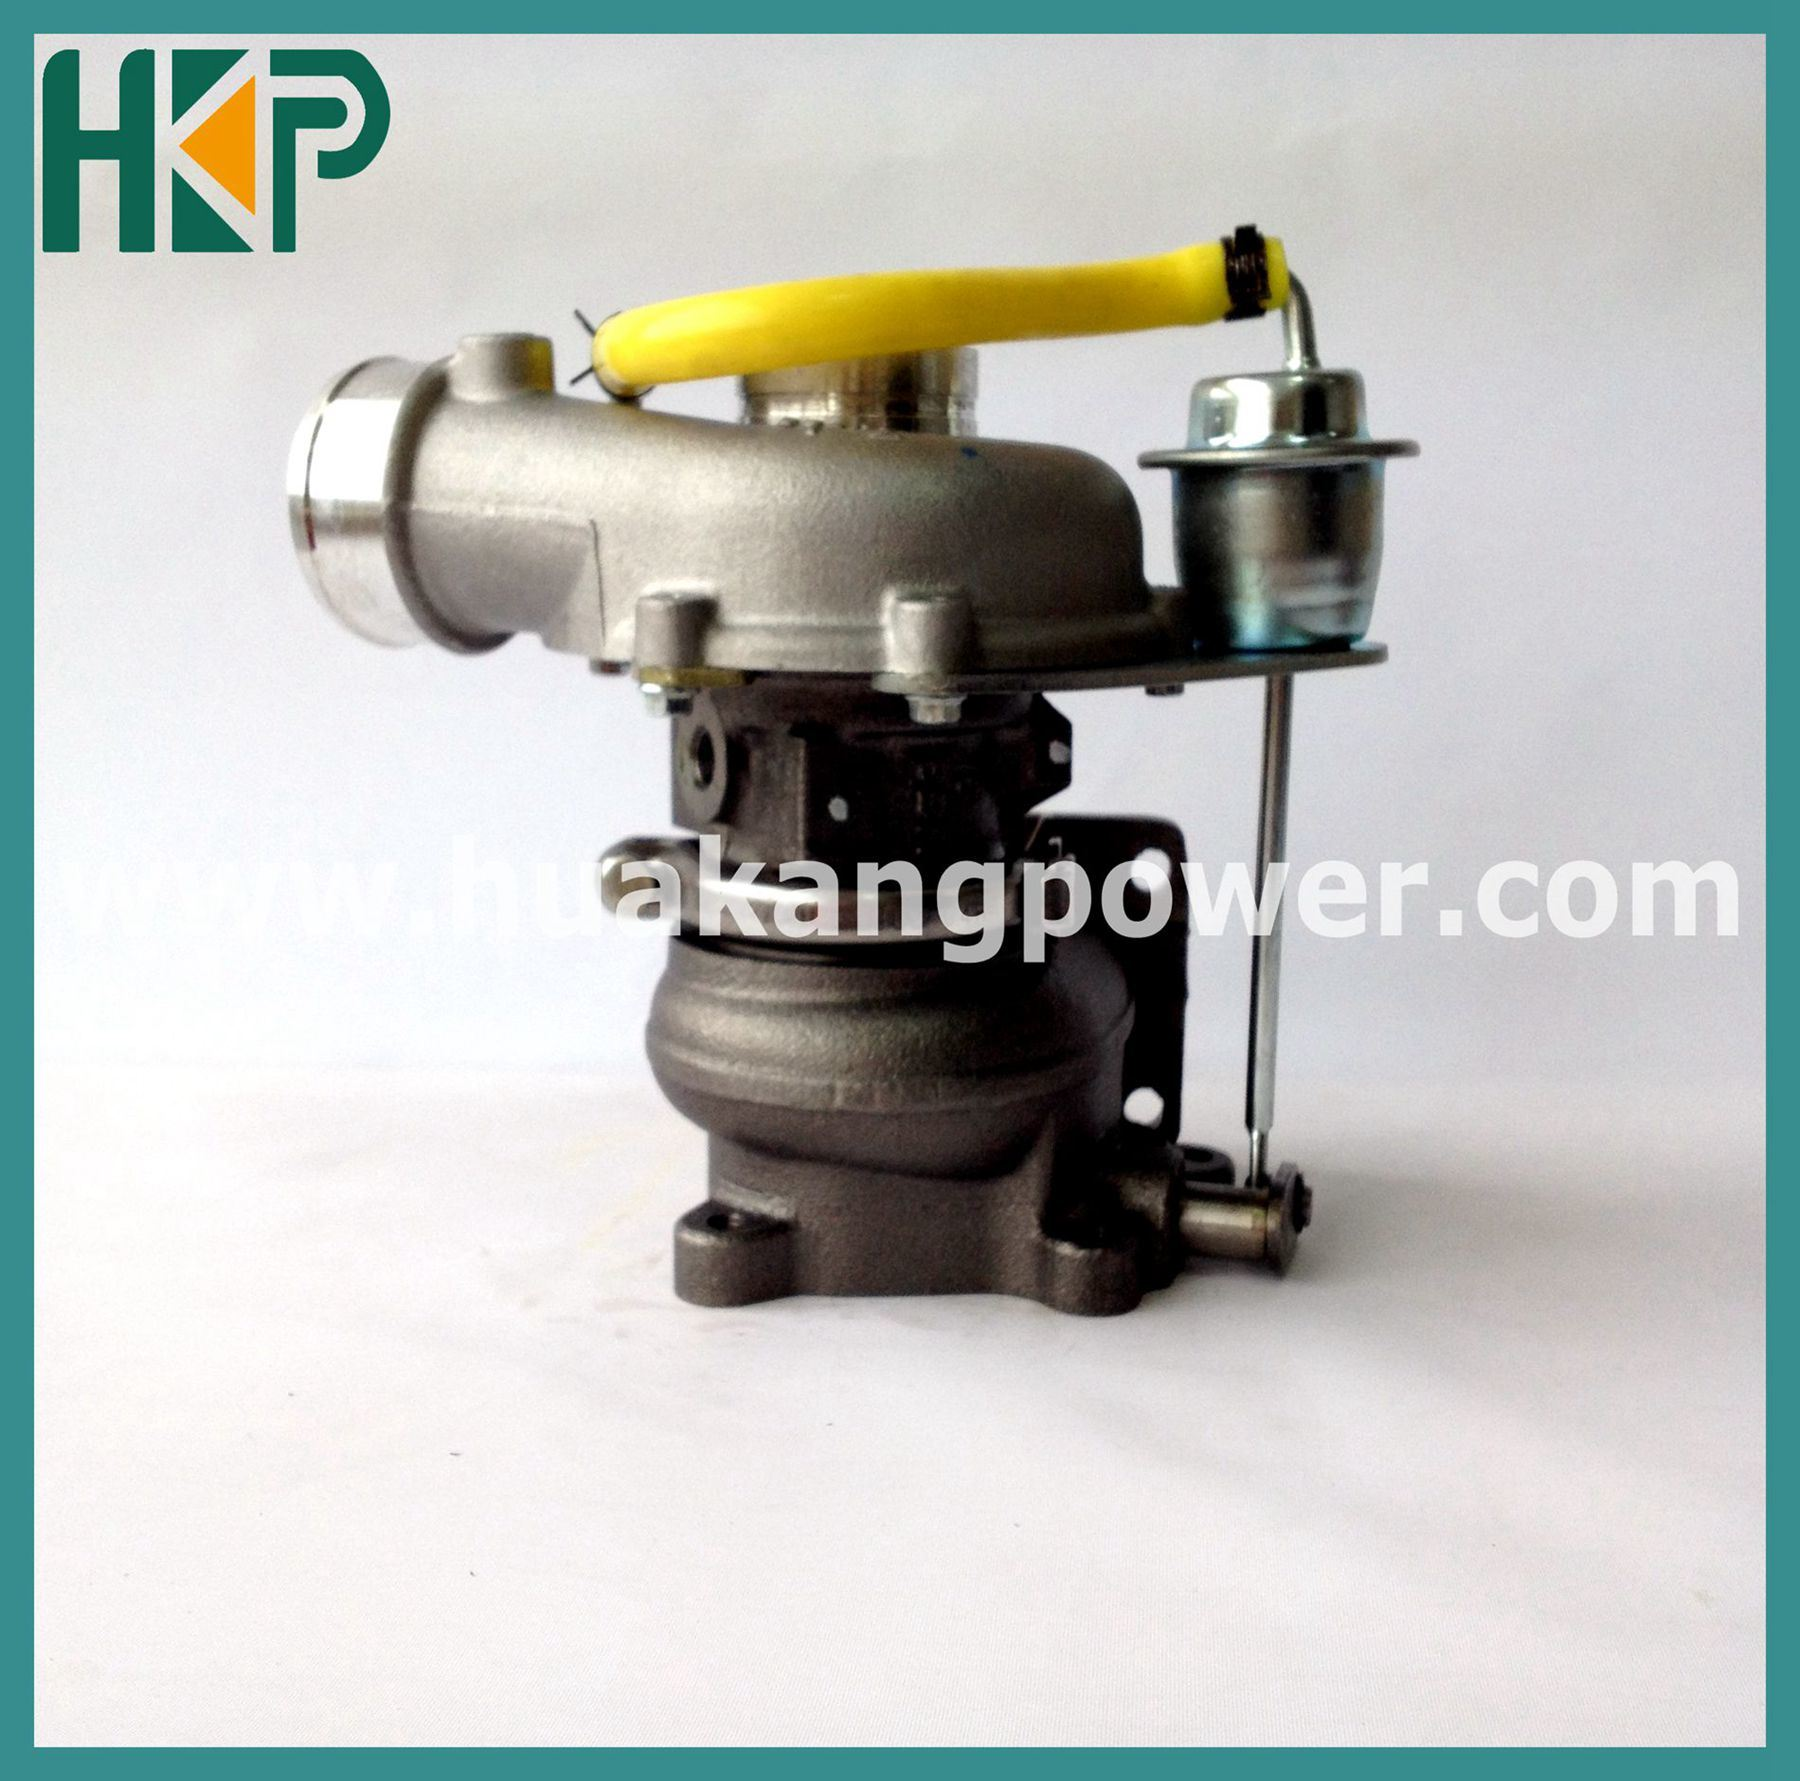 Turbo/Turbocharger for Rhf4 Vp47 Xnz1118600000